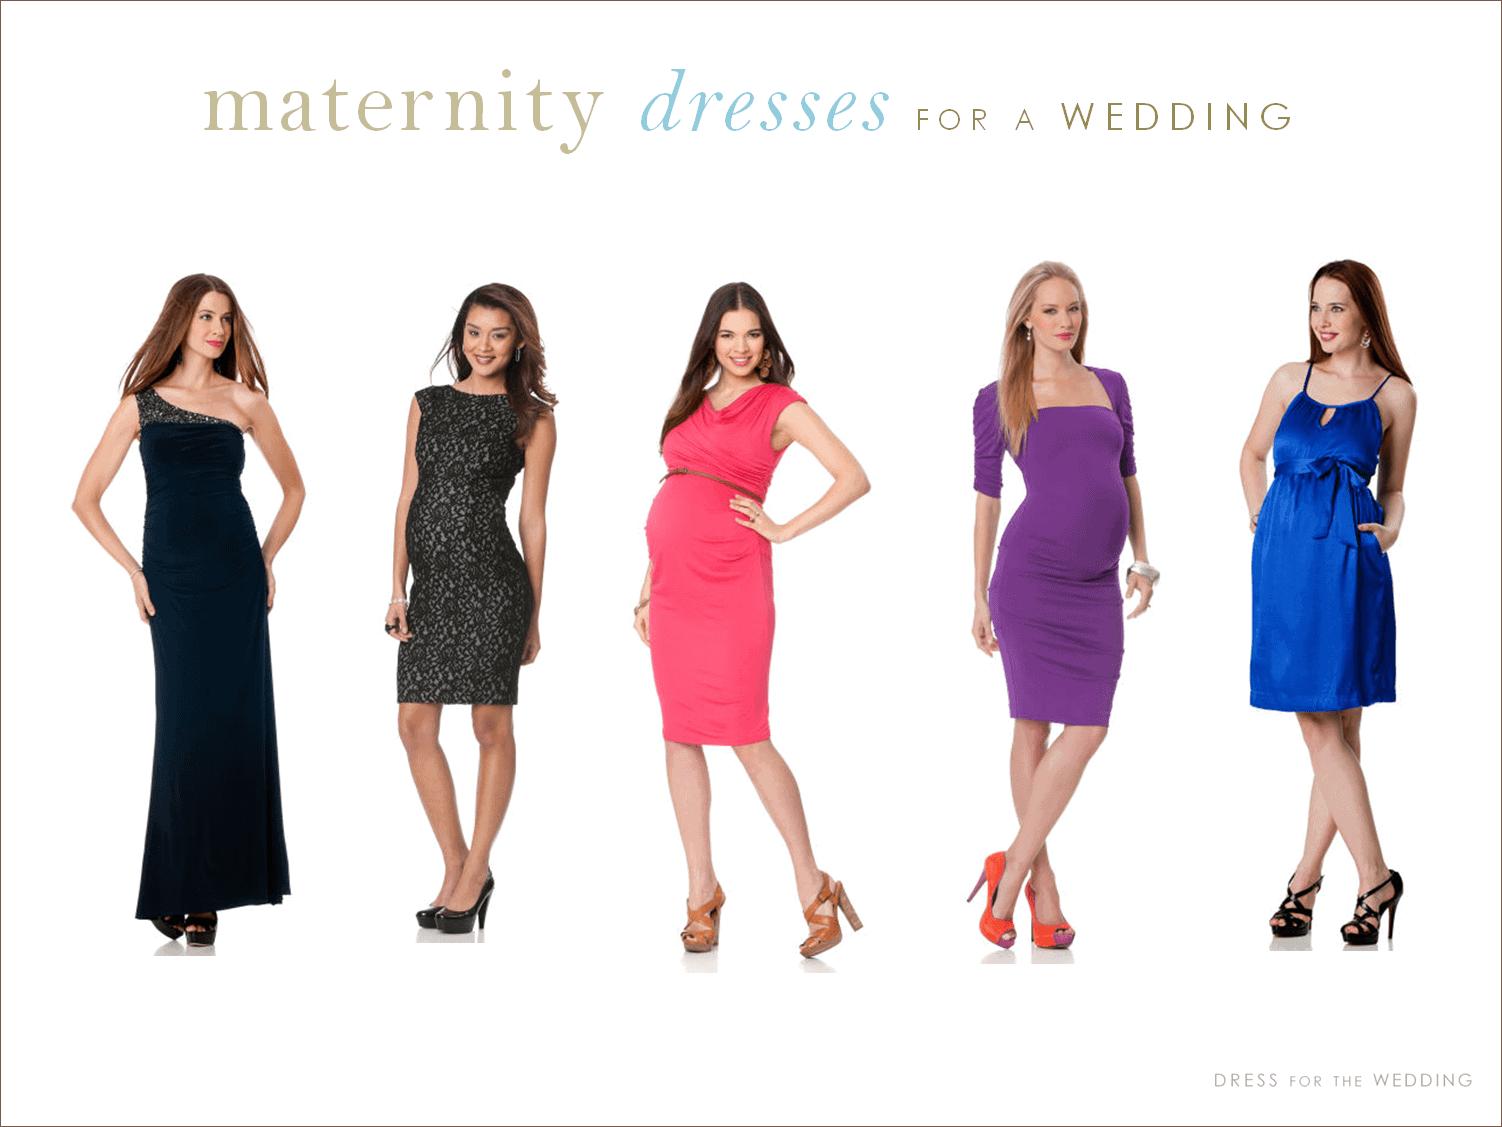 wedding guest maternity dresses fall dresses for wedding